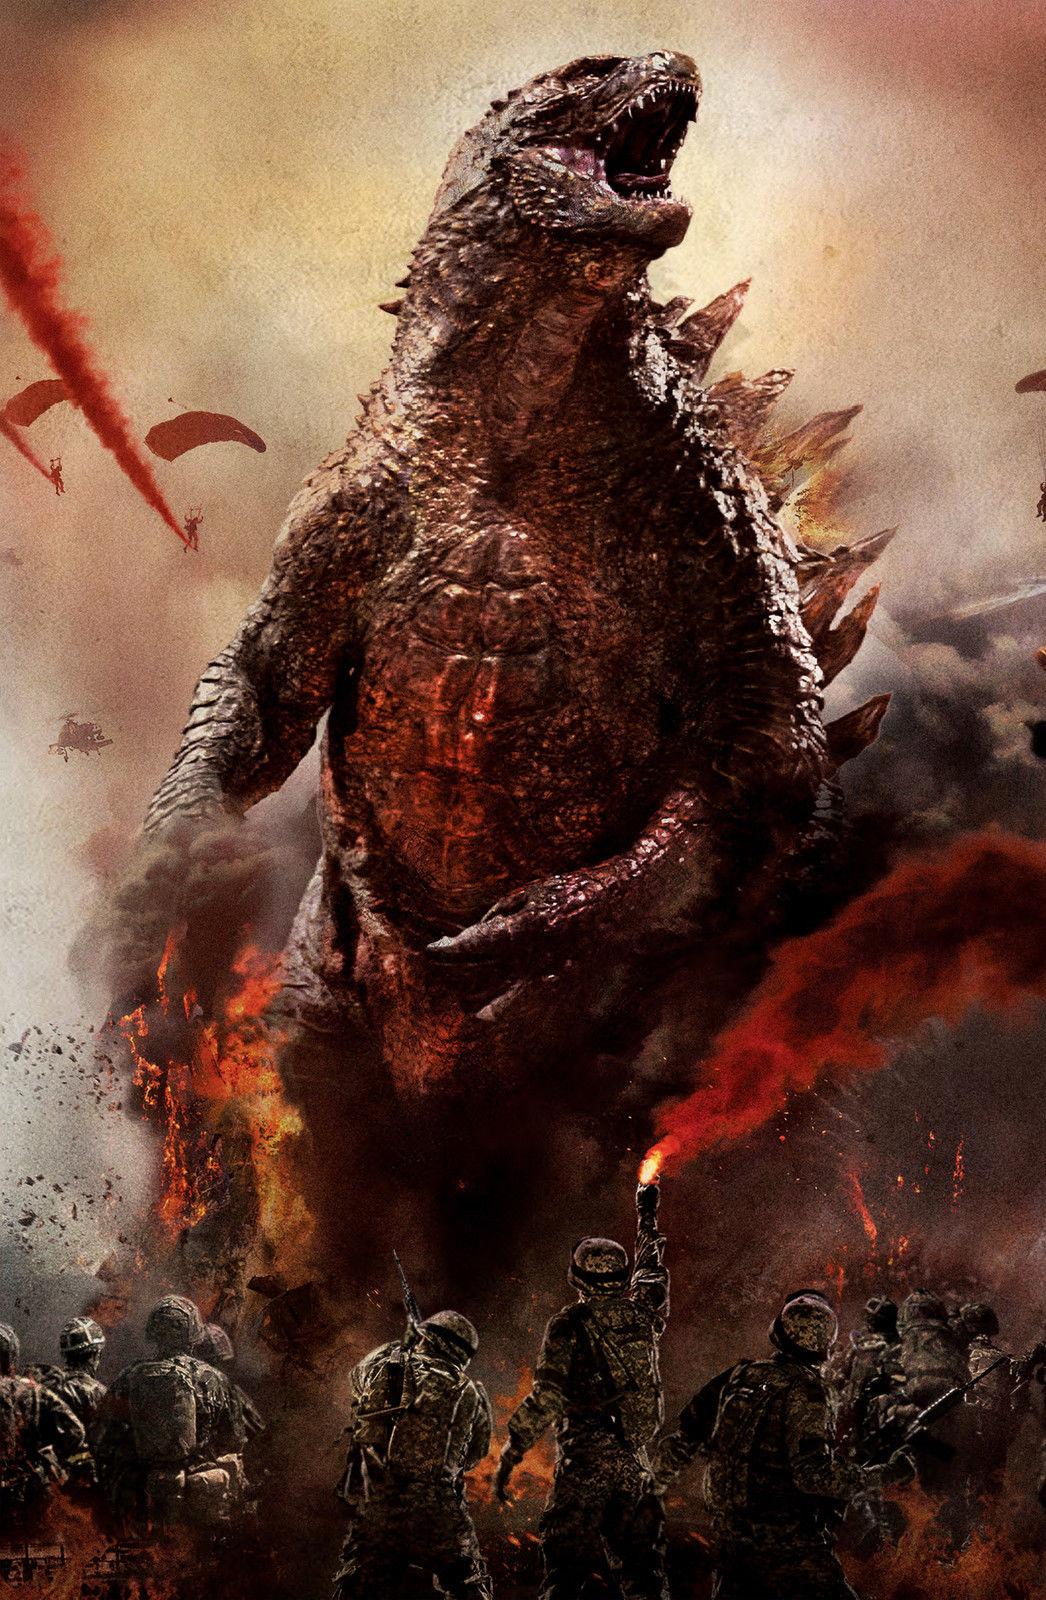 Godzilla Textless Poster